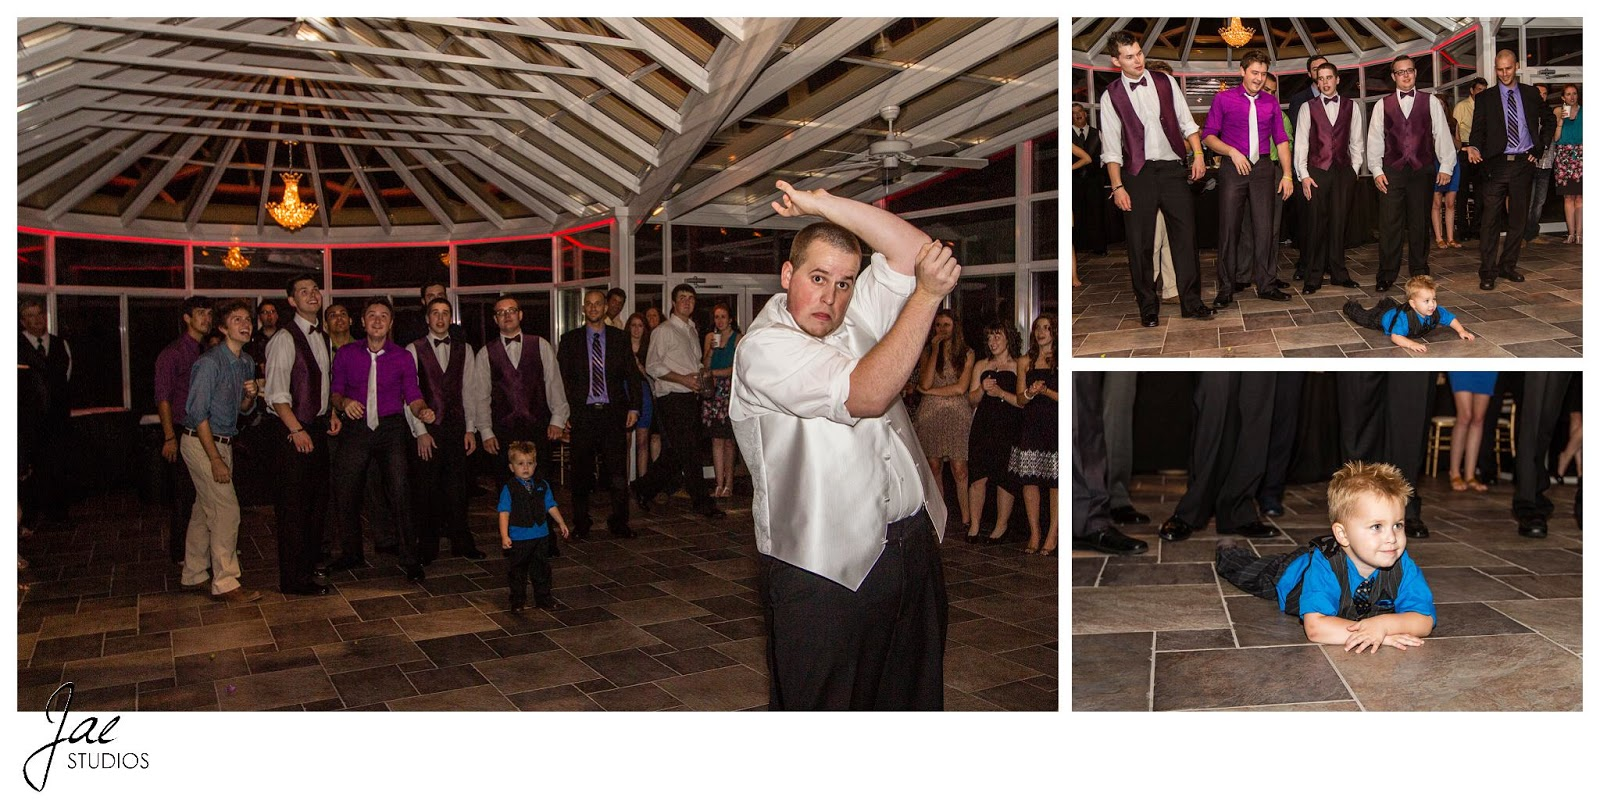 Jonathan and Julie, Bird cage, West Manor Estate, Wedding, Lynchburg, Virginia, Jae Studios, garter toss, groom, bride, child, groomsmen, single men